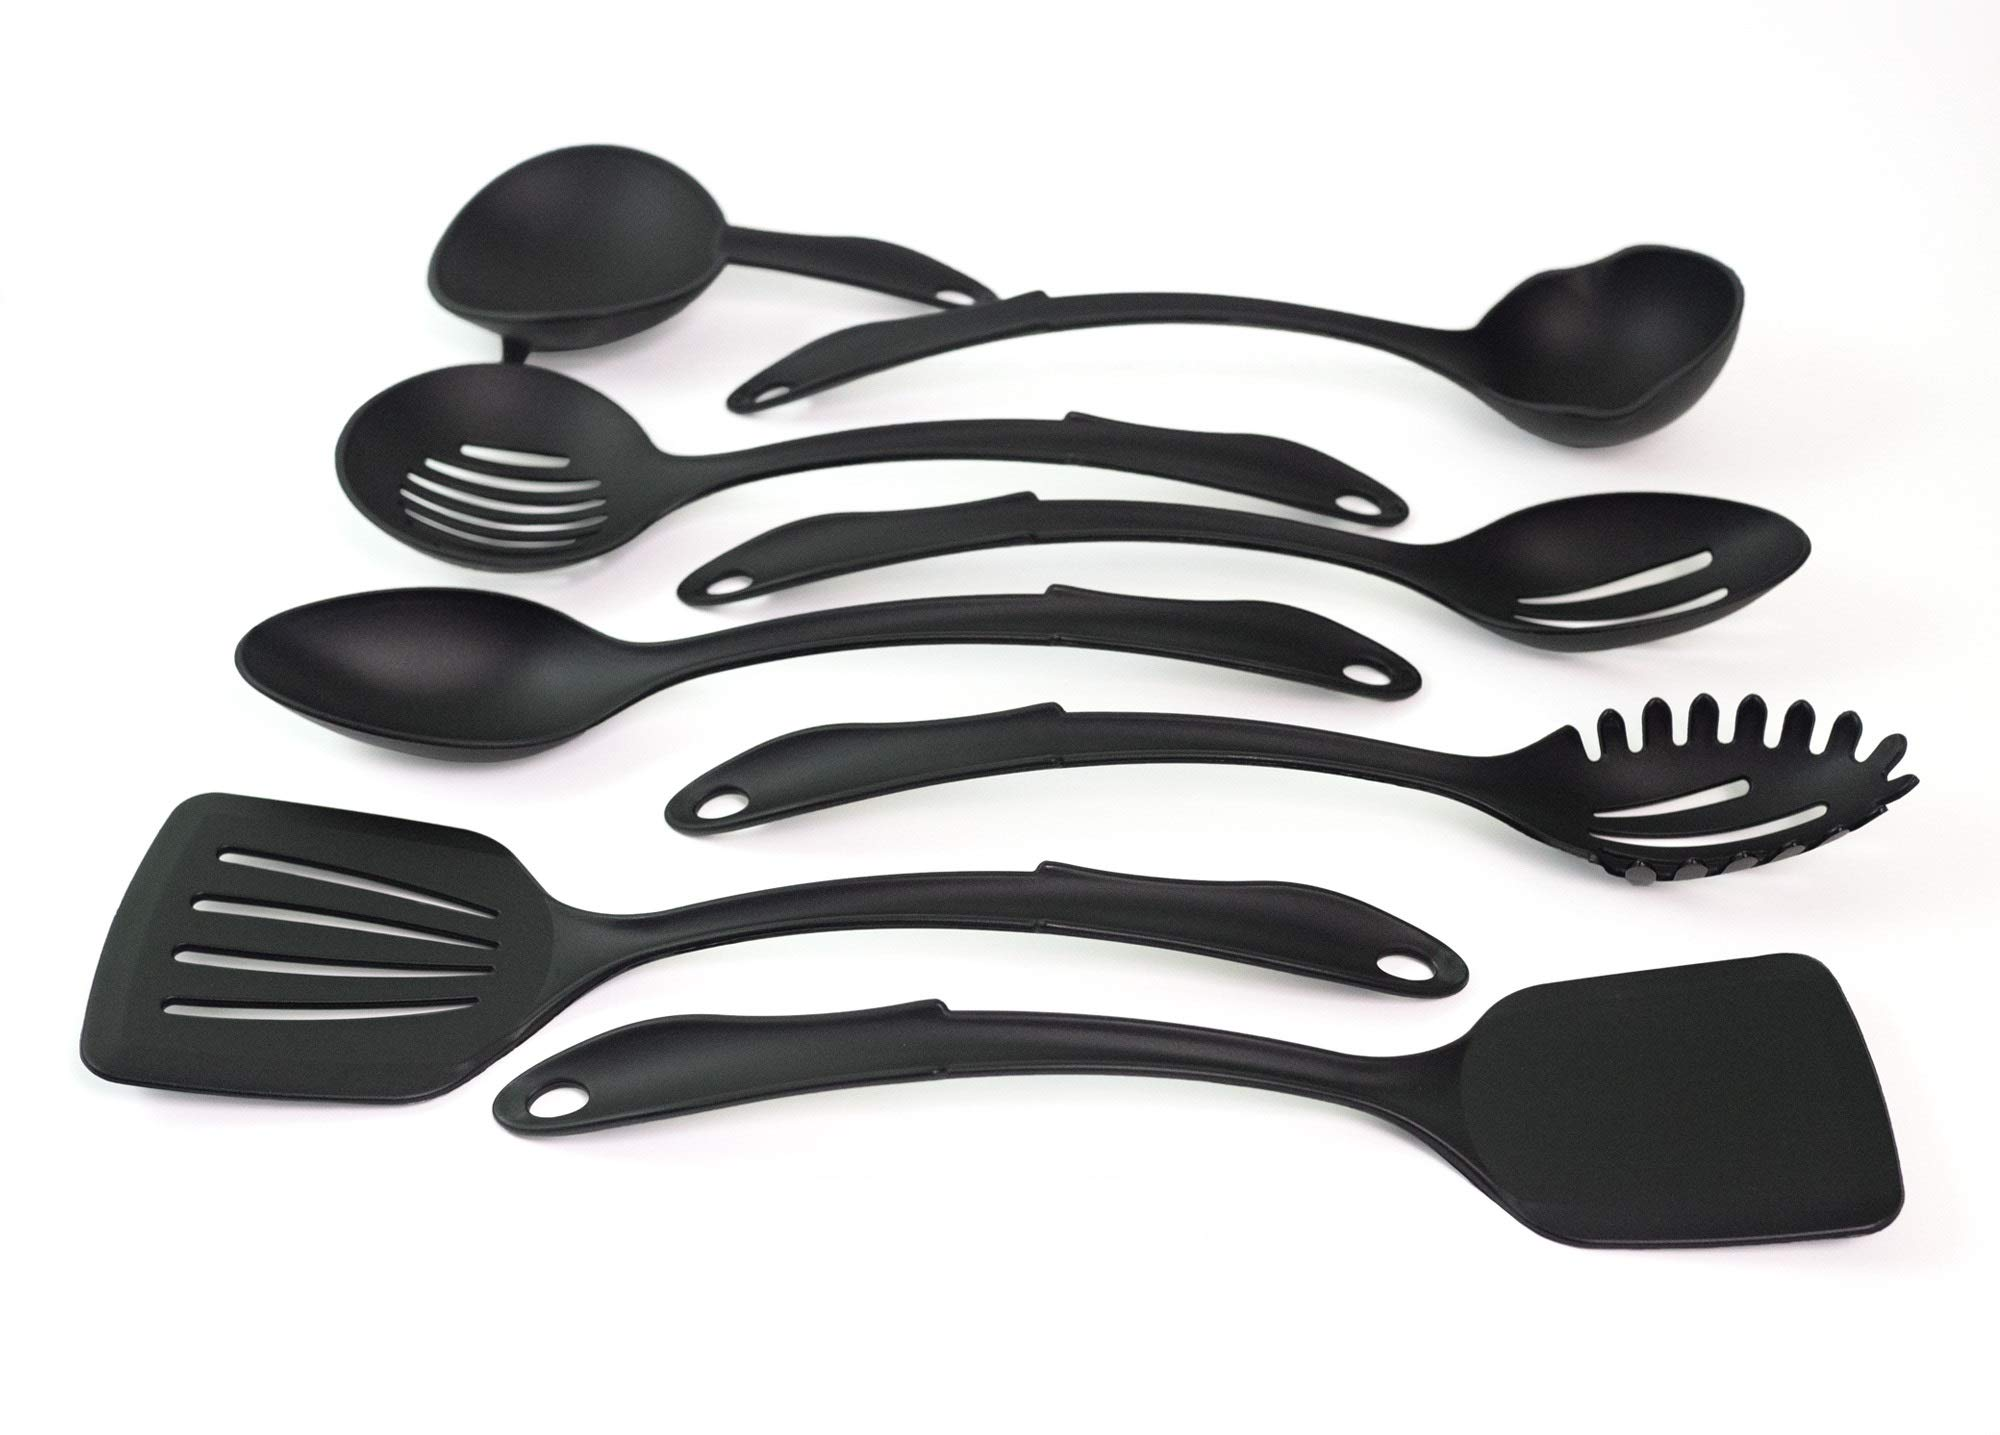 Kitchen Utensil Set Made in USA, 8 Best Kitchen Utensils - Nonstick Cooking Spatula,NYLON Kit, Solid Turner, Slotted Turner, Slotted Spoon, Basting Spoon, Strainer, Spoon Rest, Ladle, Pasta Server